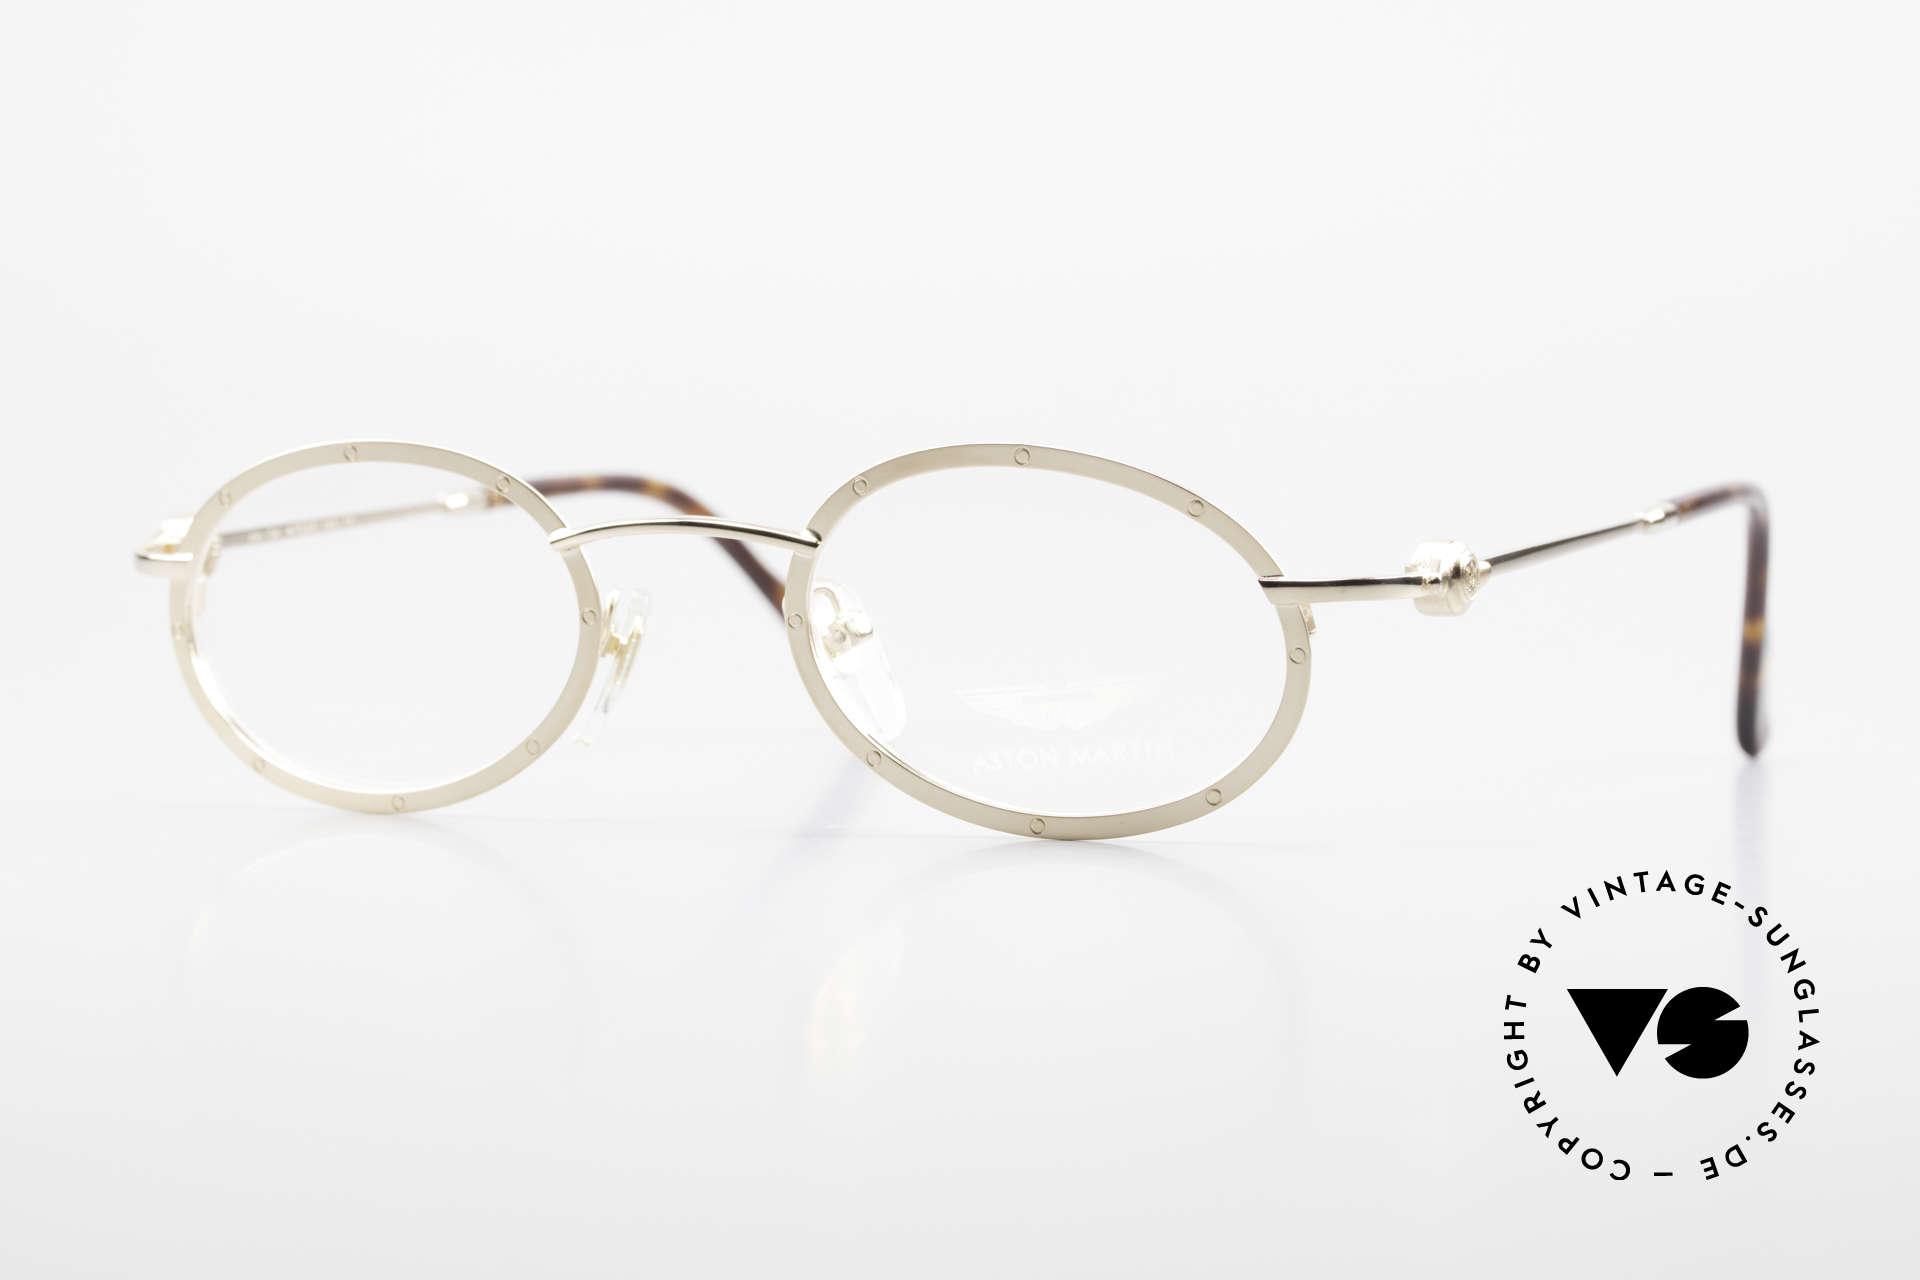 Aston Martin AM34 Oval James Bond Glasses 007, Aston Martin vintage luxury designer eyeglasses, 47°23, Made for Men